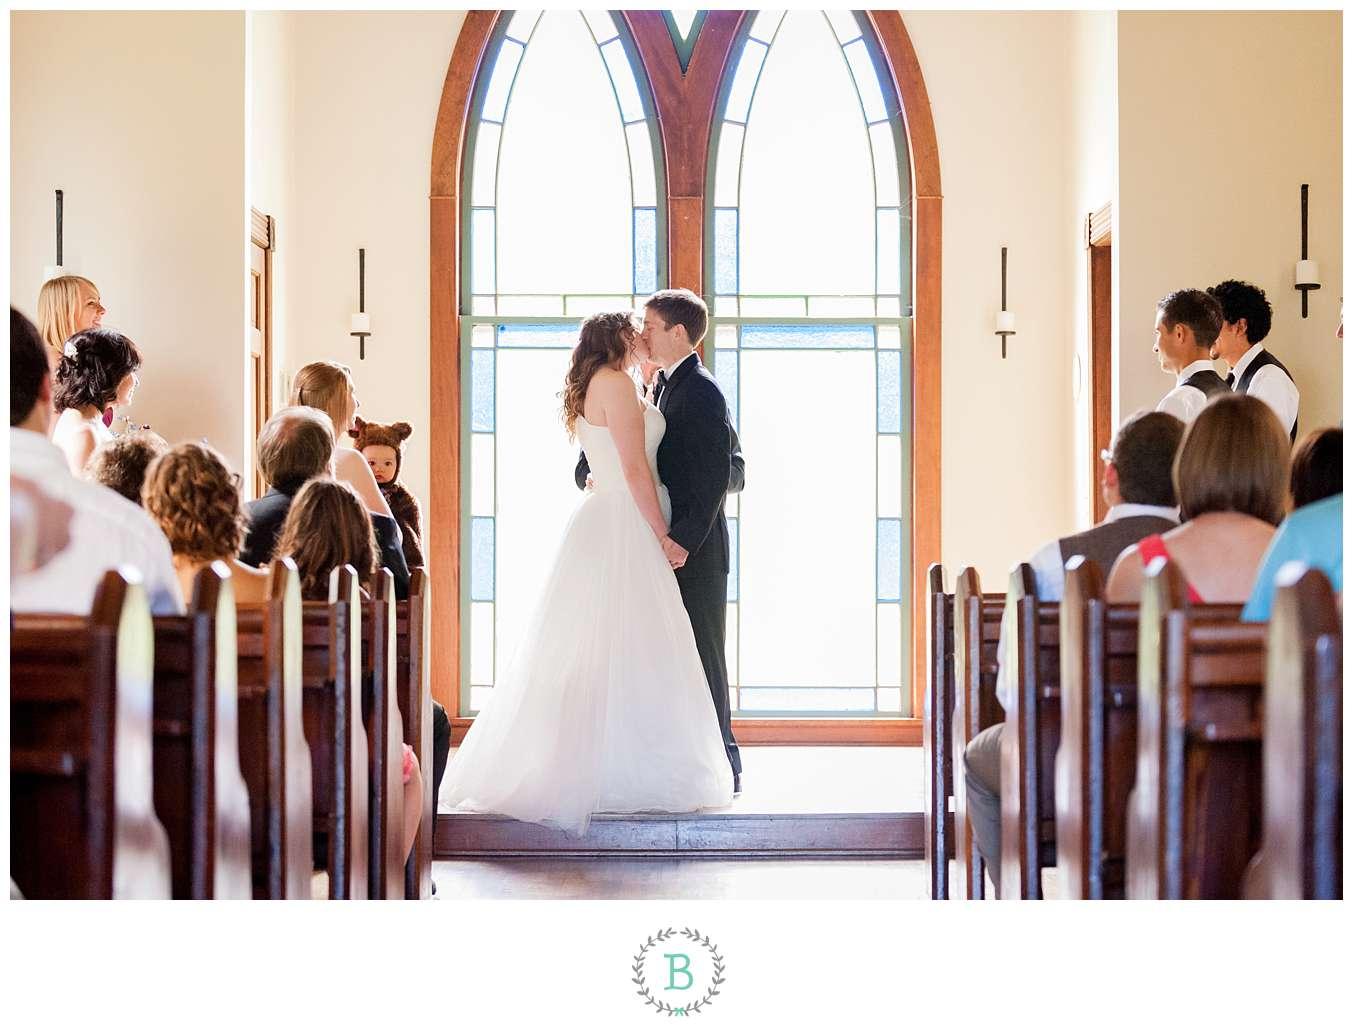 B-Jones-Photography-Seattle-Wedding-Photographer_0812.jpg